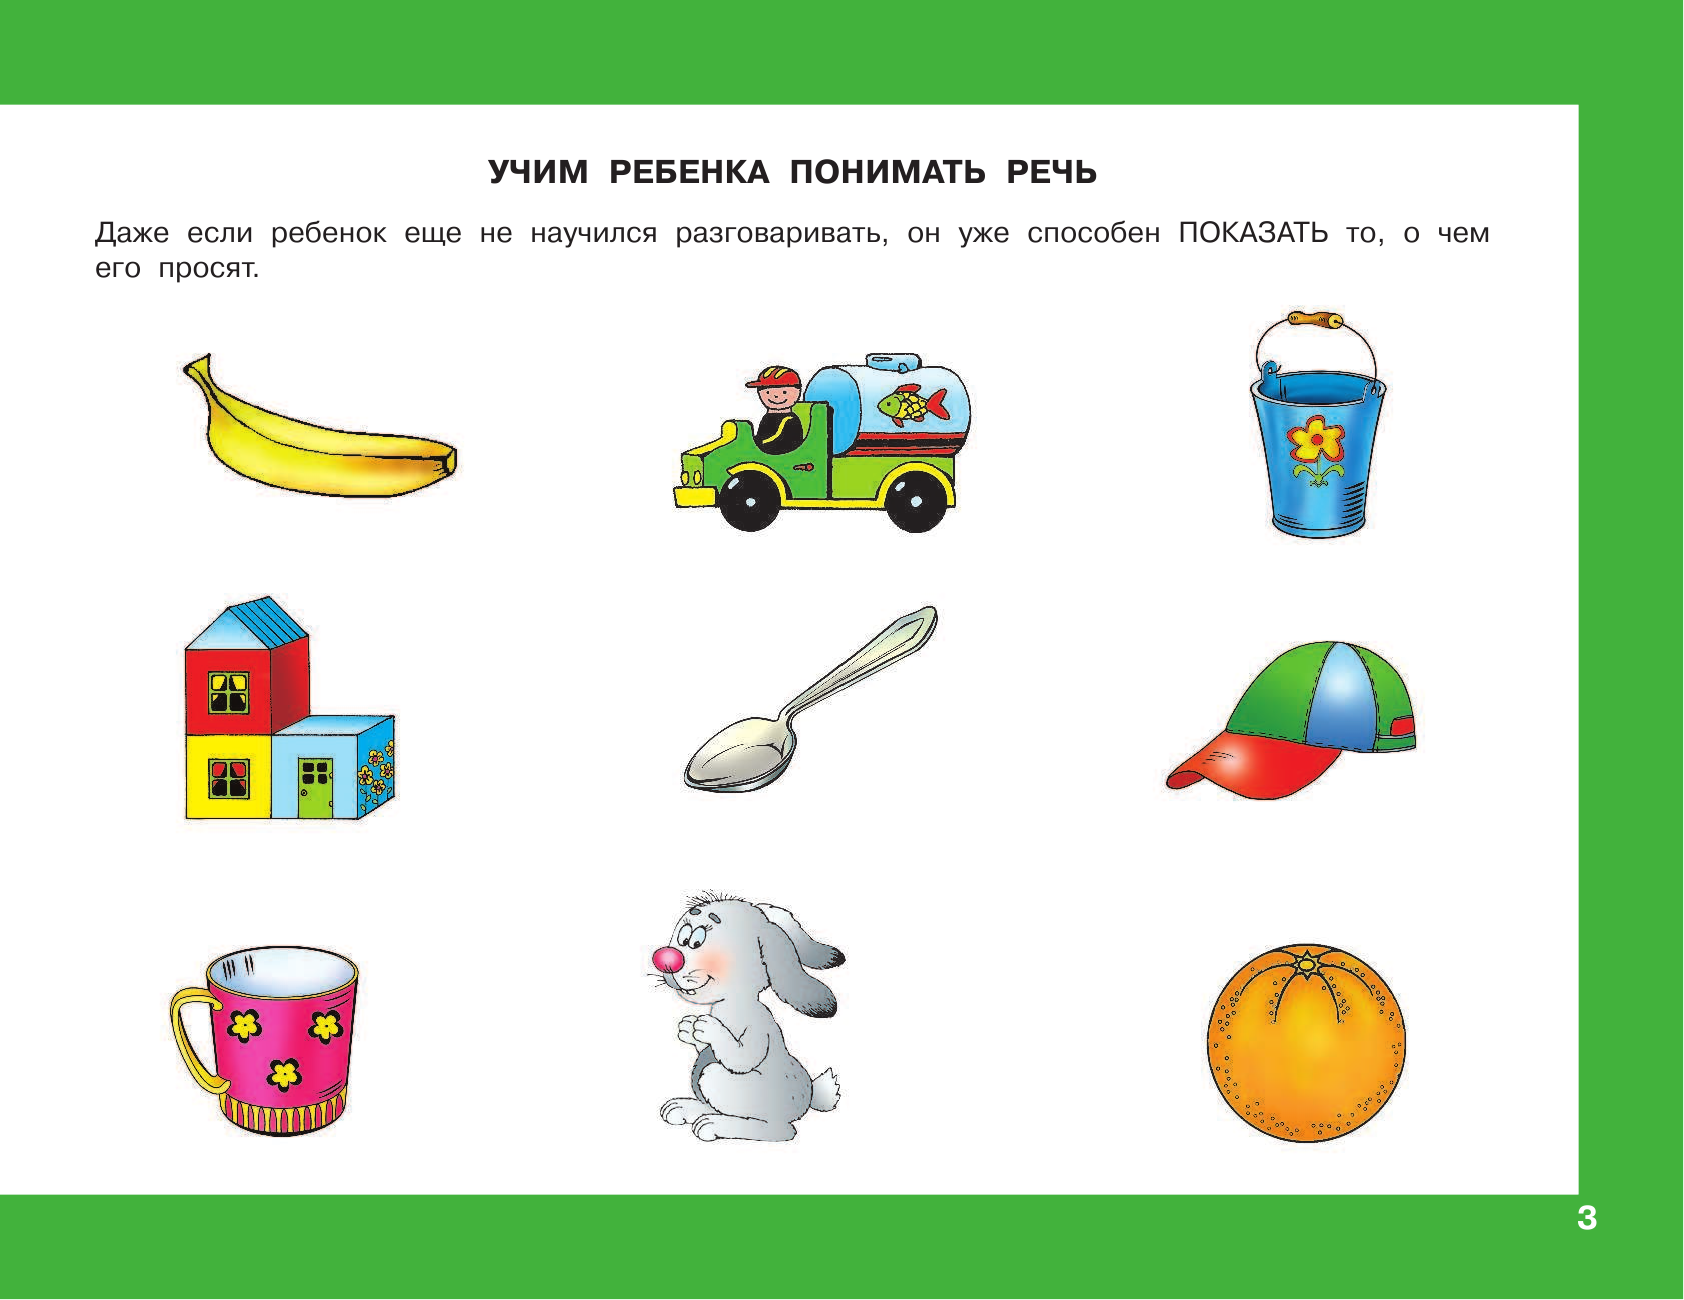 домашний логопед с картинками продаже